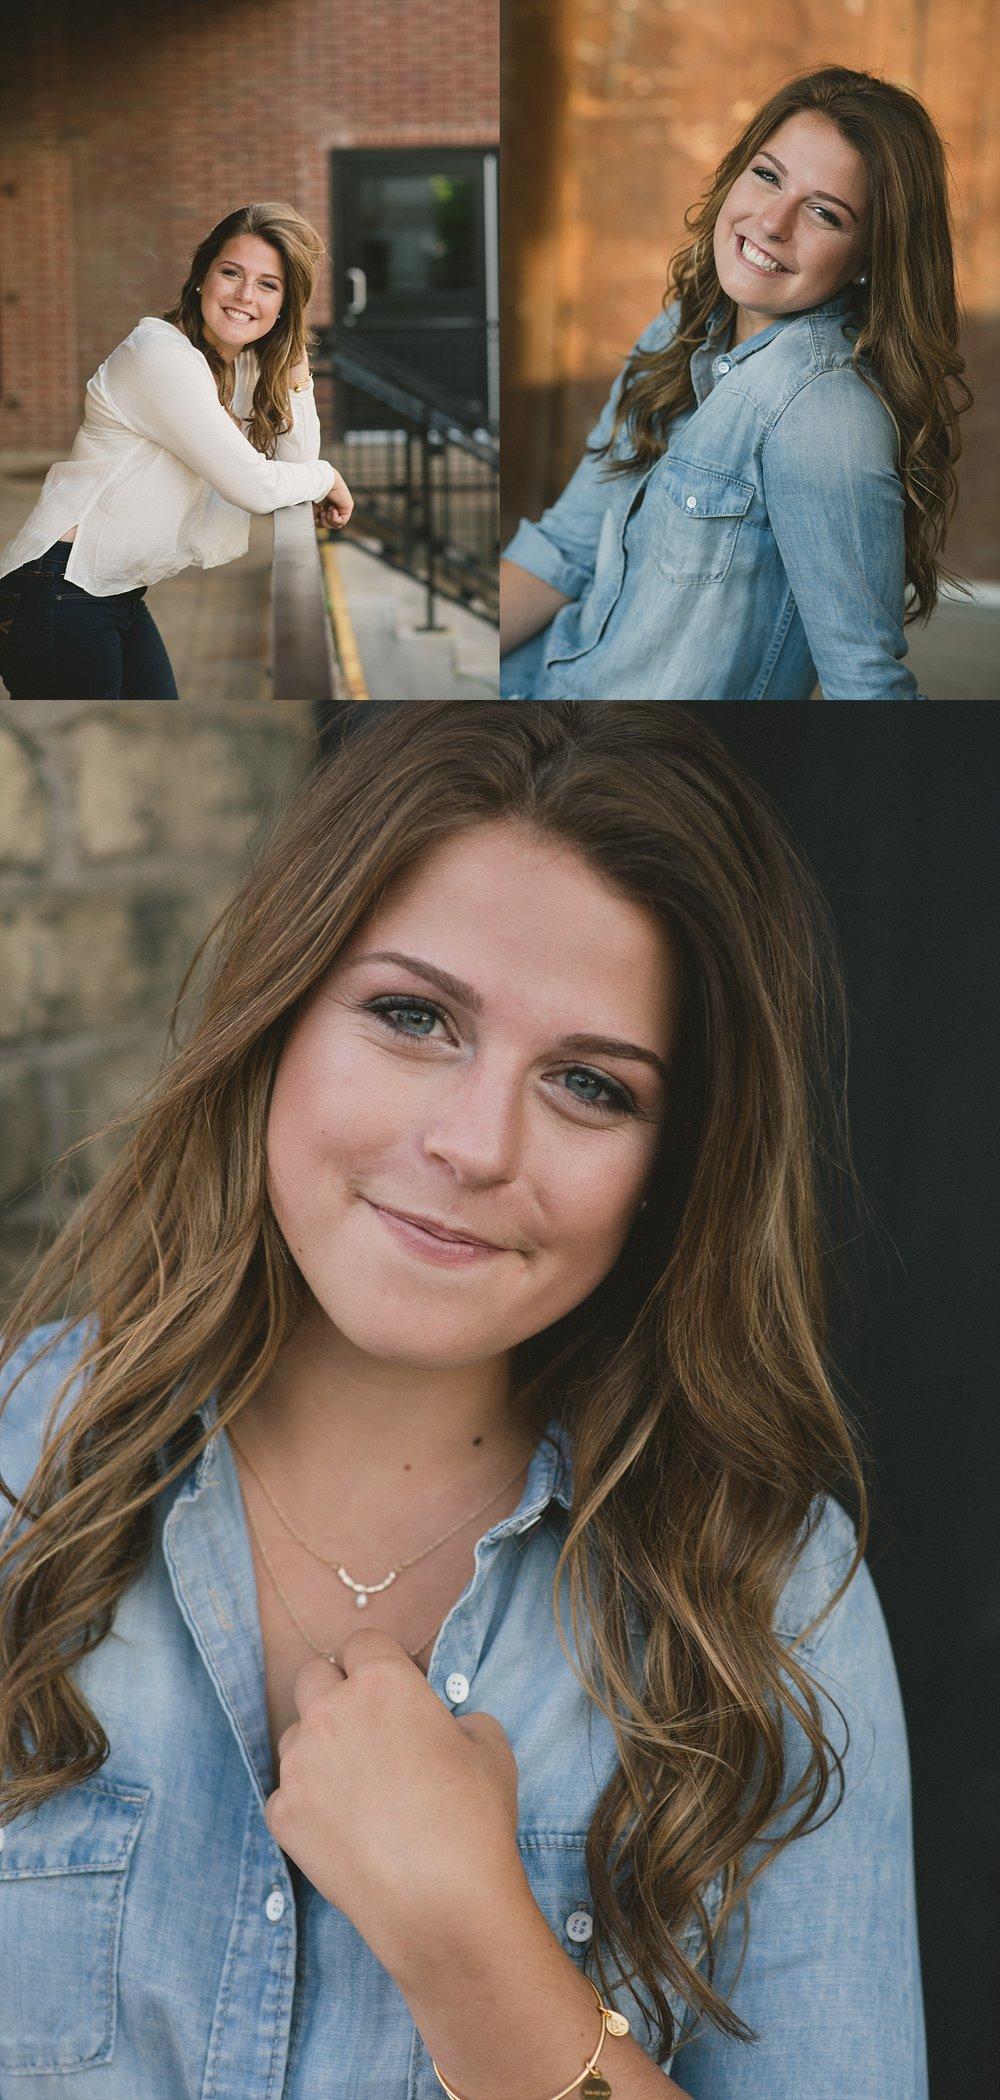 Elyse Rethlake Photography  - Portrait  Photographer - ElyseRethlake.com_0017.jpg